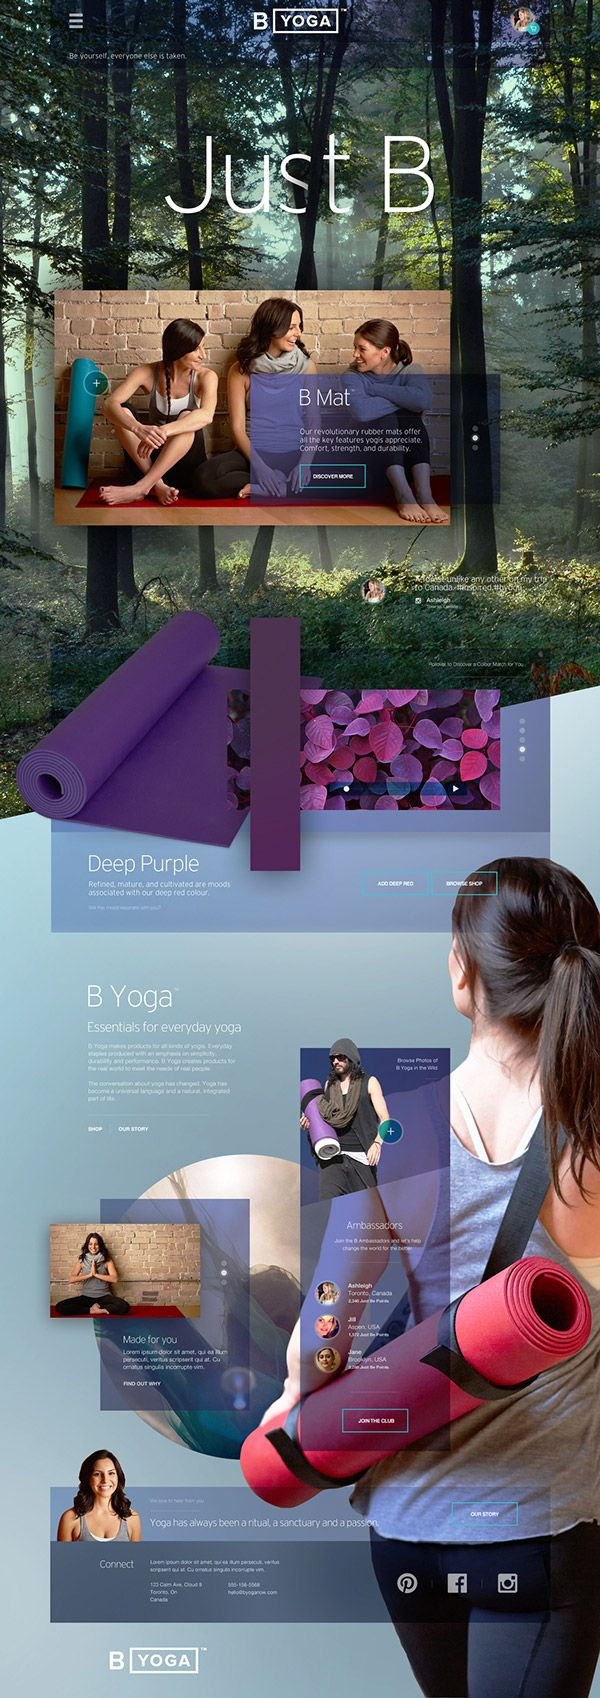 Lotos Yoga Centre On Behance Yoga Center Yoga Centre